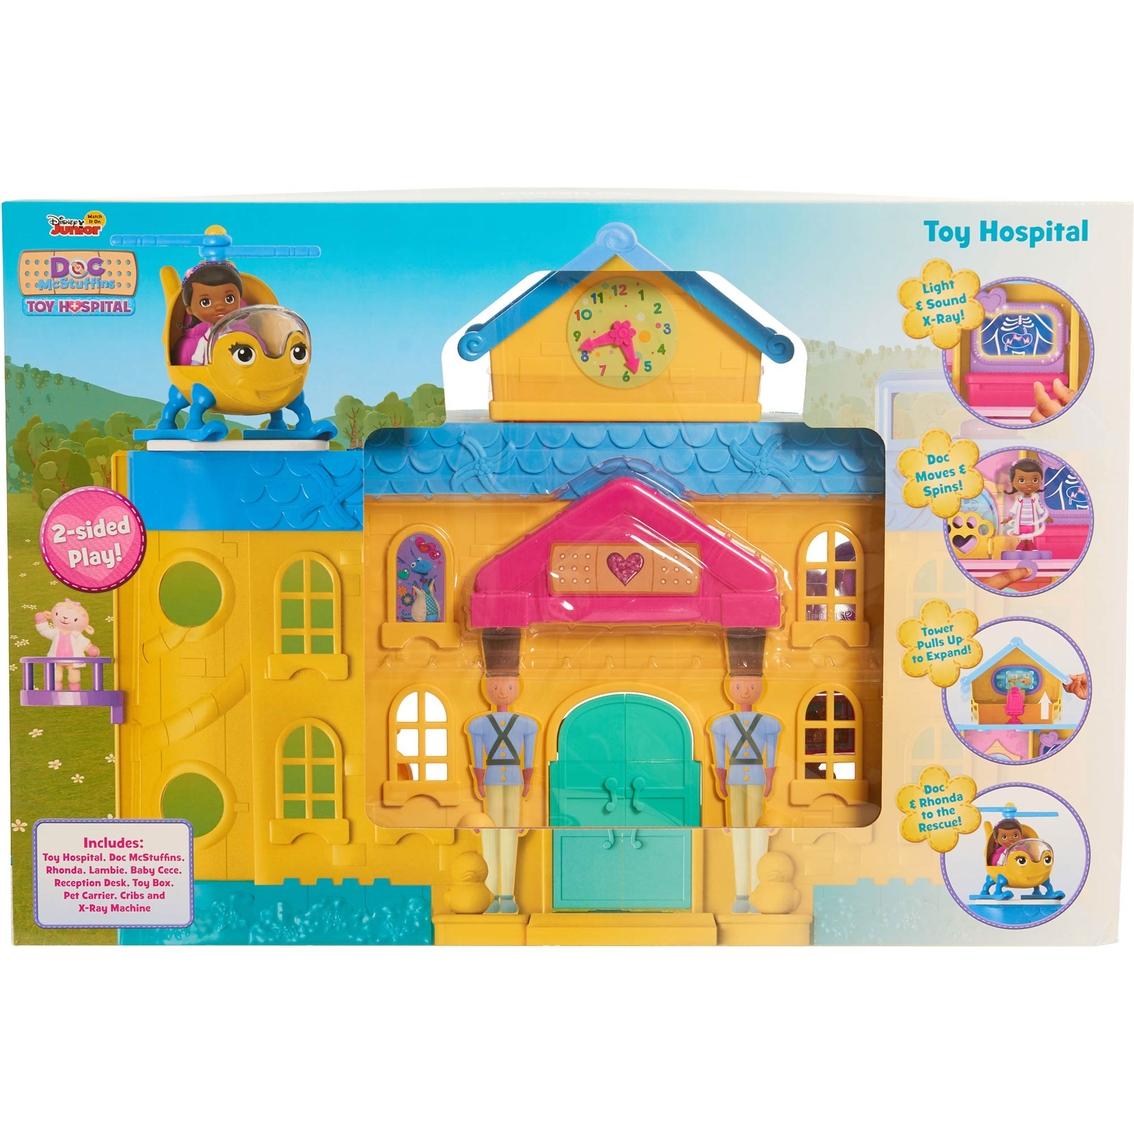 Doc Mcstuffins Toys : Disney junior doc mcstuffins toy hospital playset